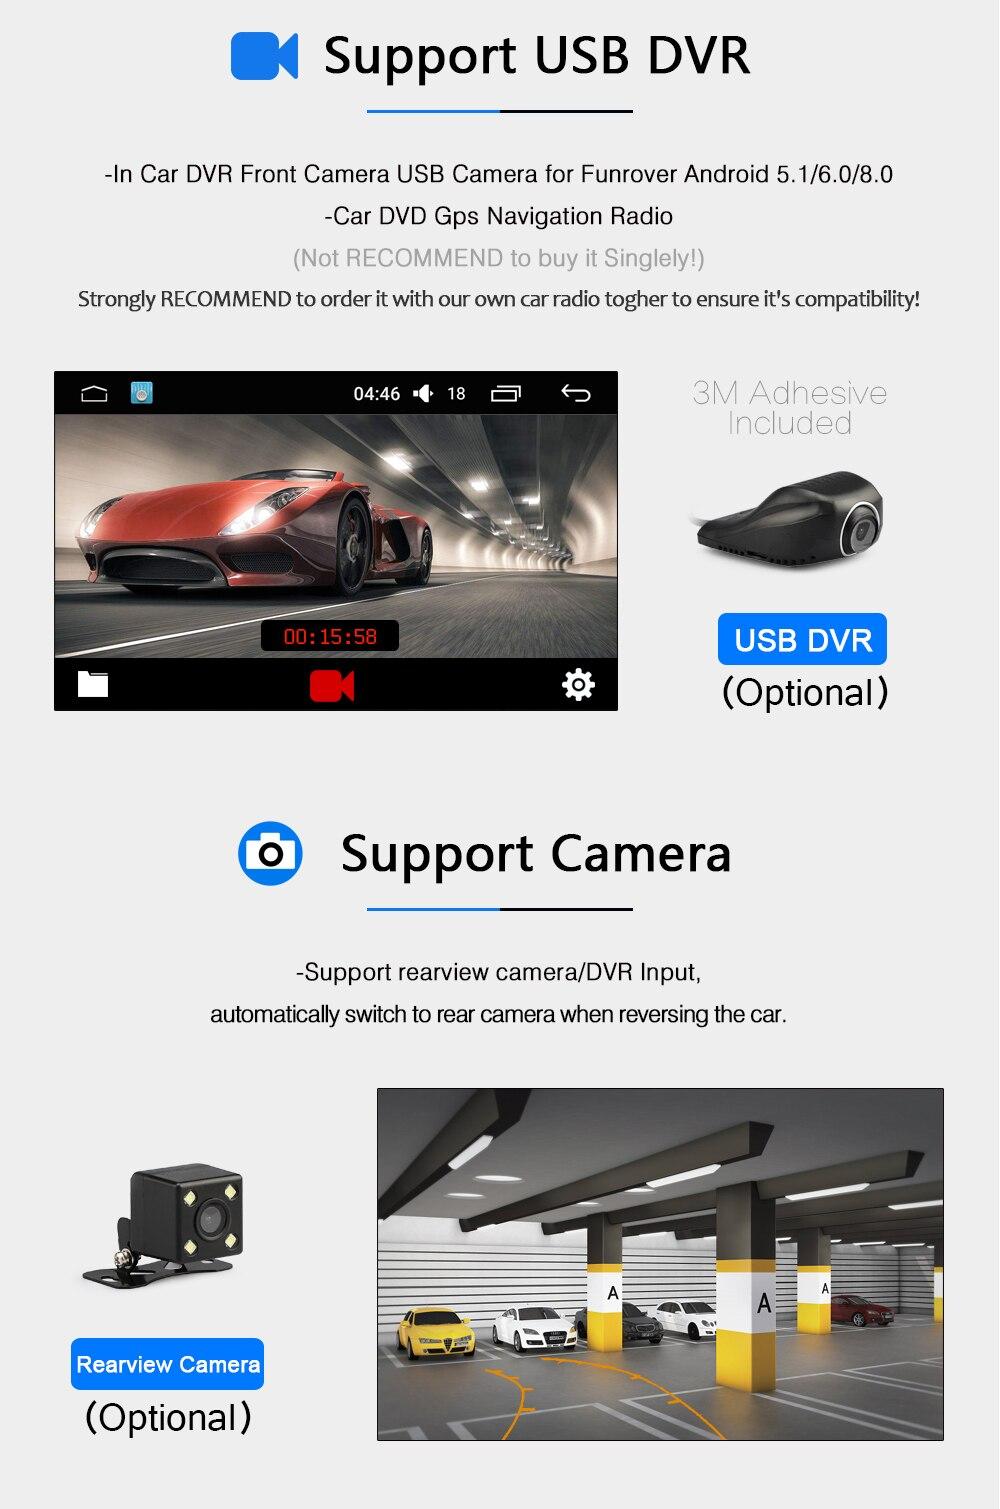 B6 7universal 2 din car radio gps android 6.0 2din Car DVD Player GPS NAVIGATION For VW Nissan TOYOTA Volkswagen peugeot